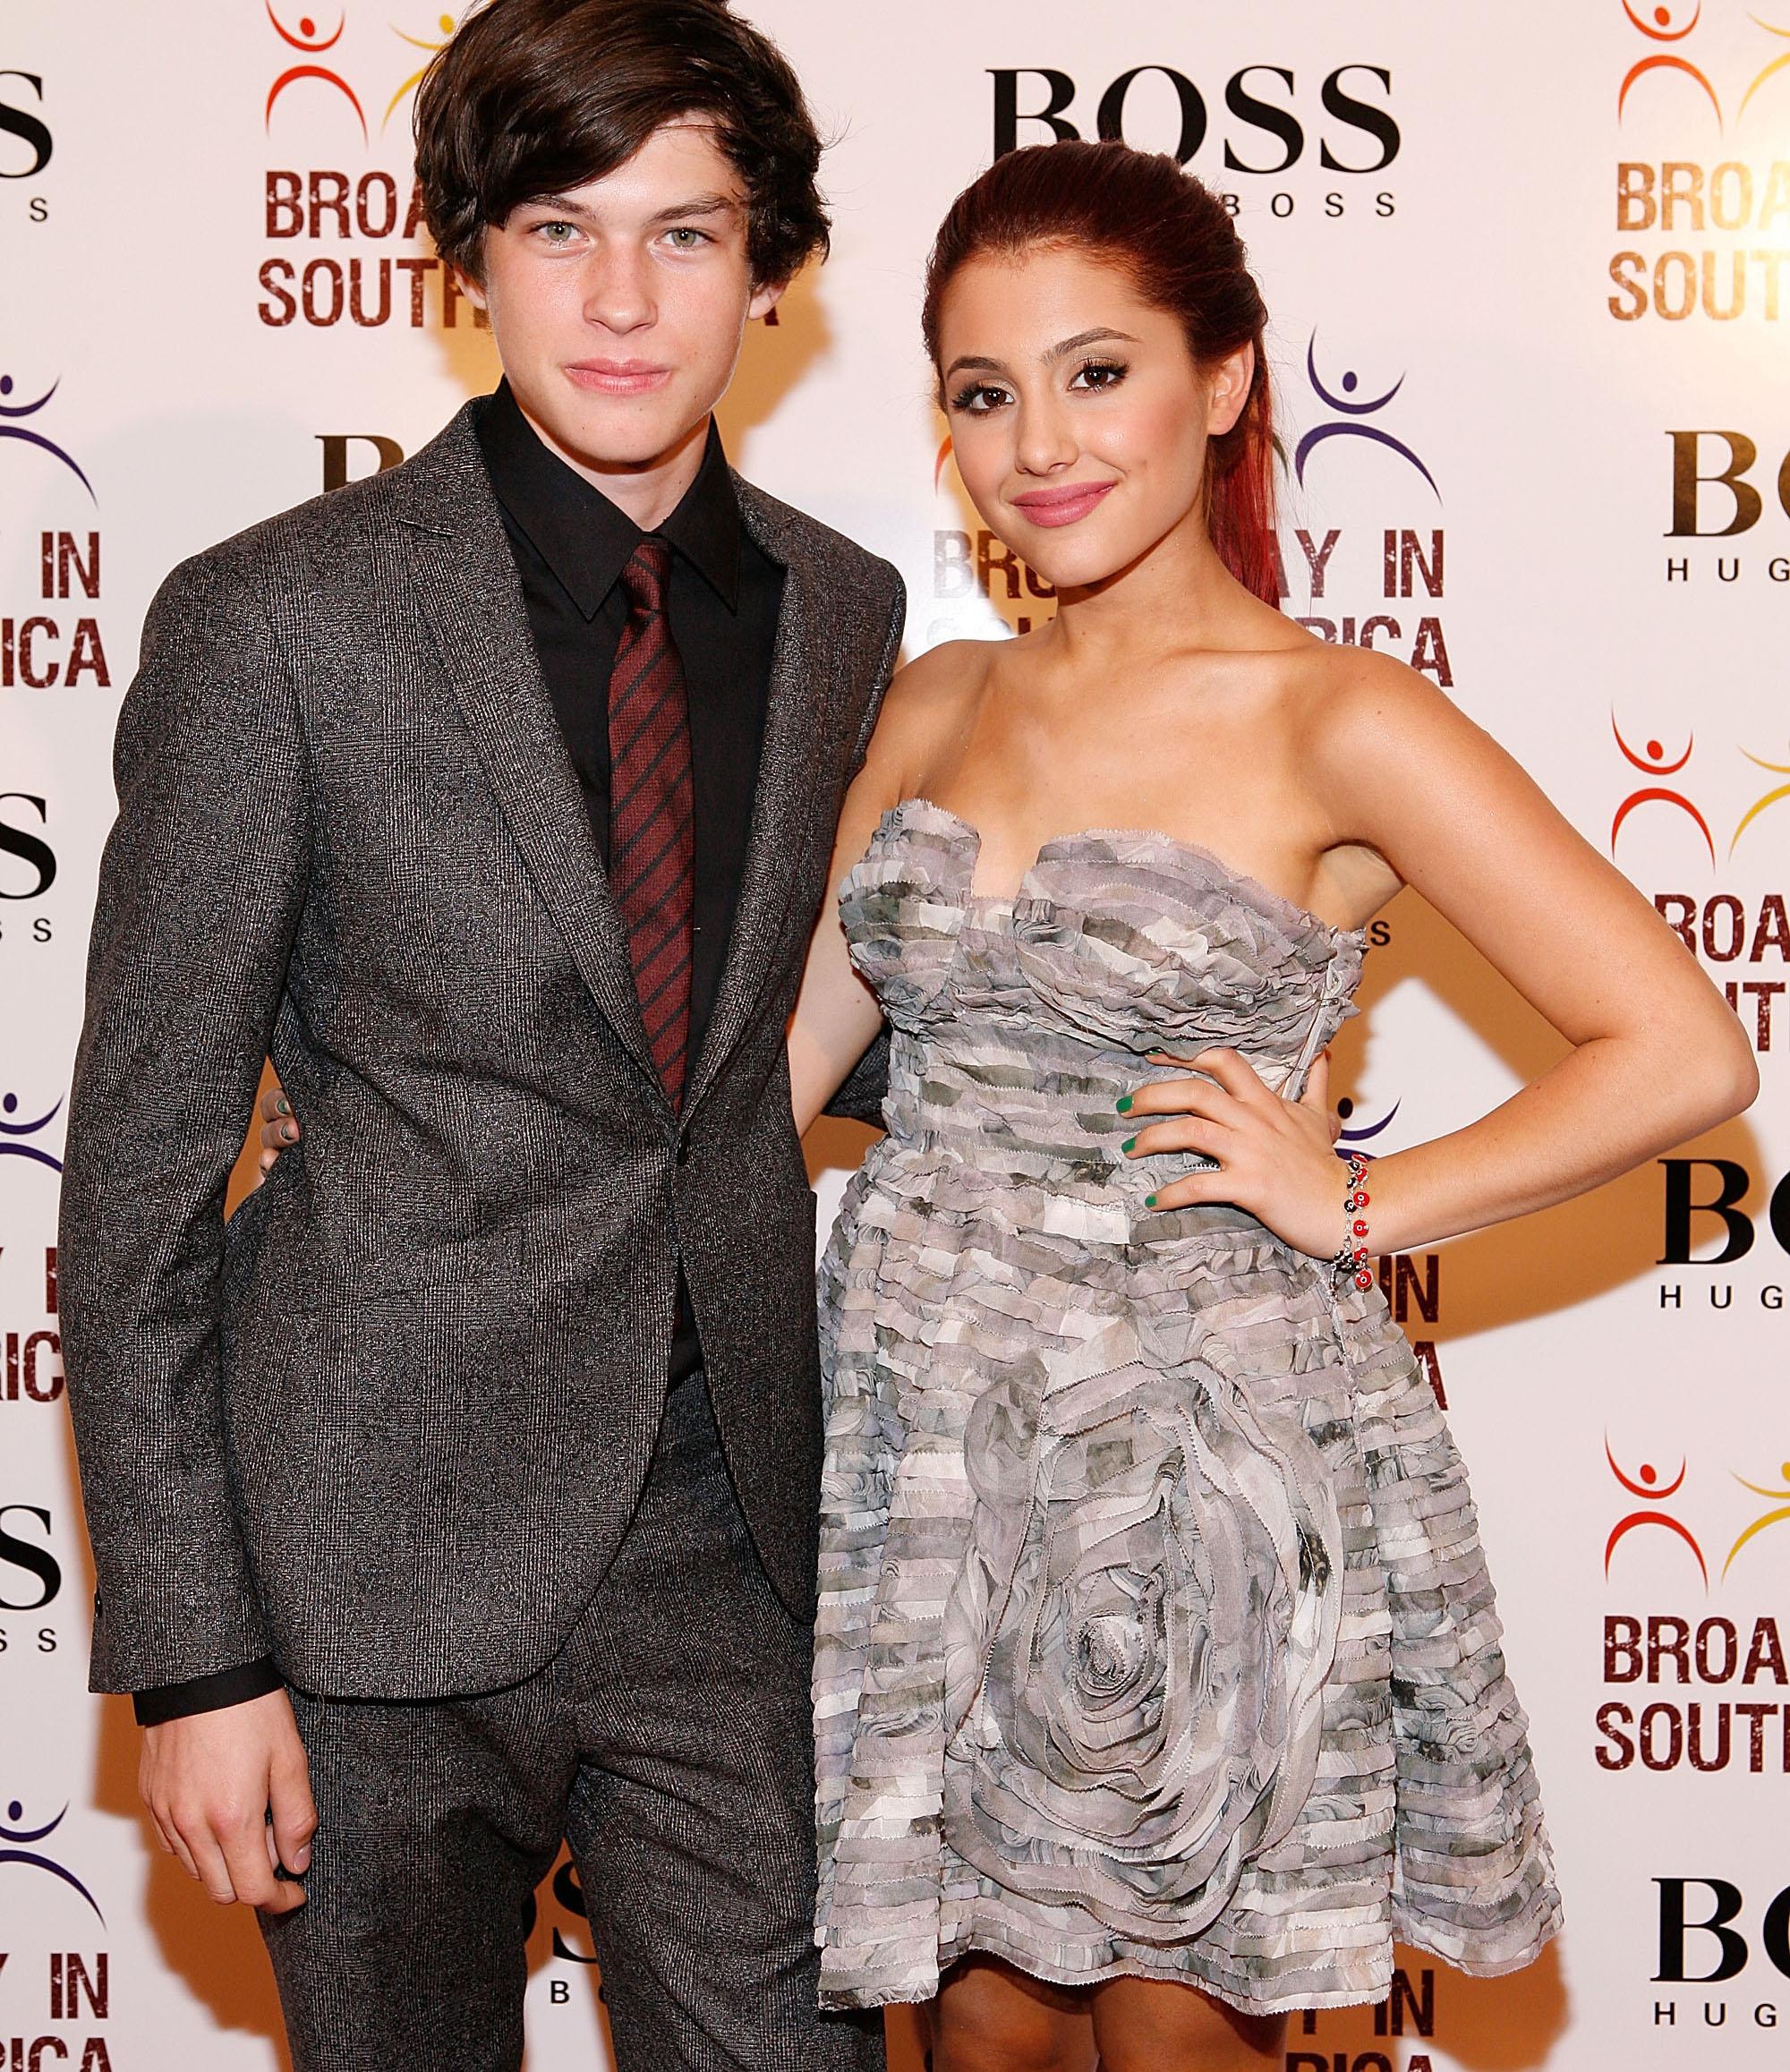 Ariana Grande Reunites With Ex-Boyfriend Graham PhillipsGraham Phillips And Ariana Grande Tumblr